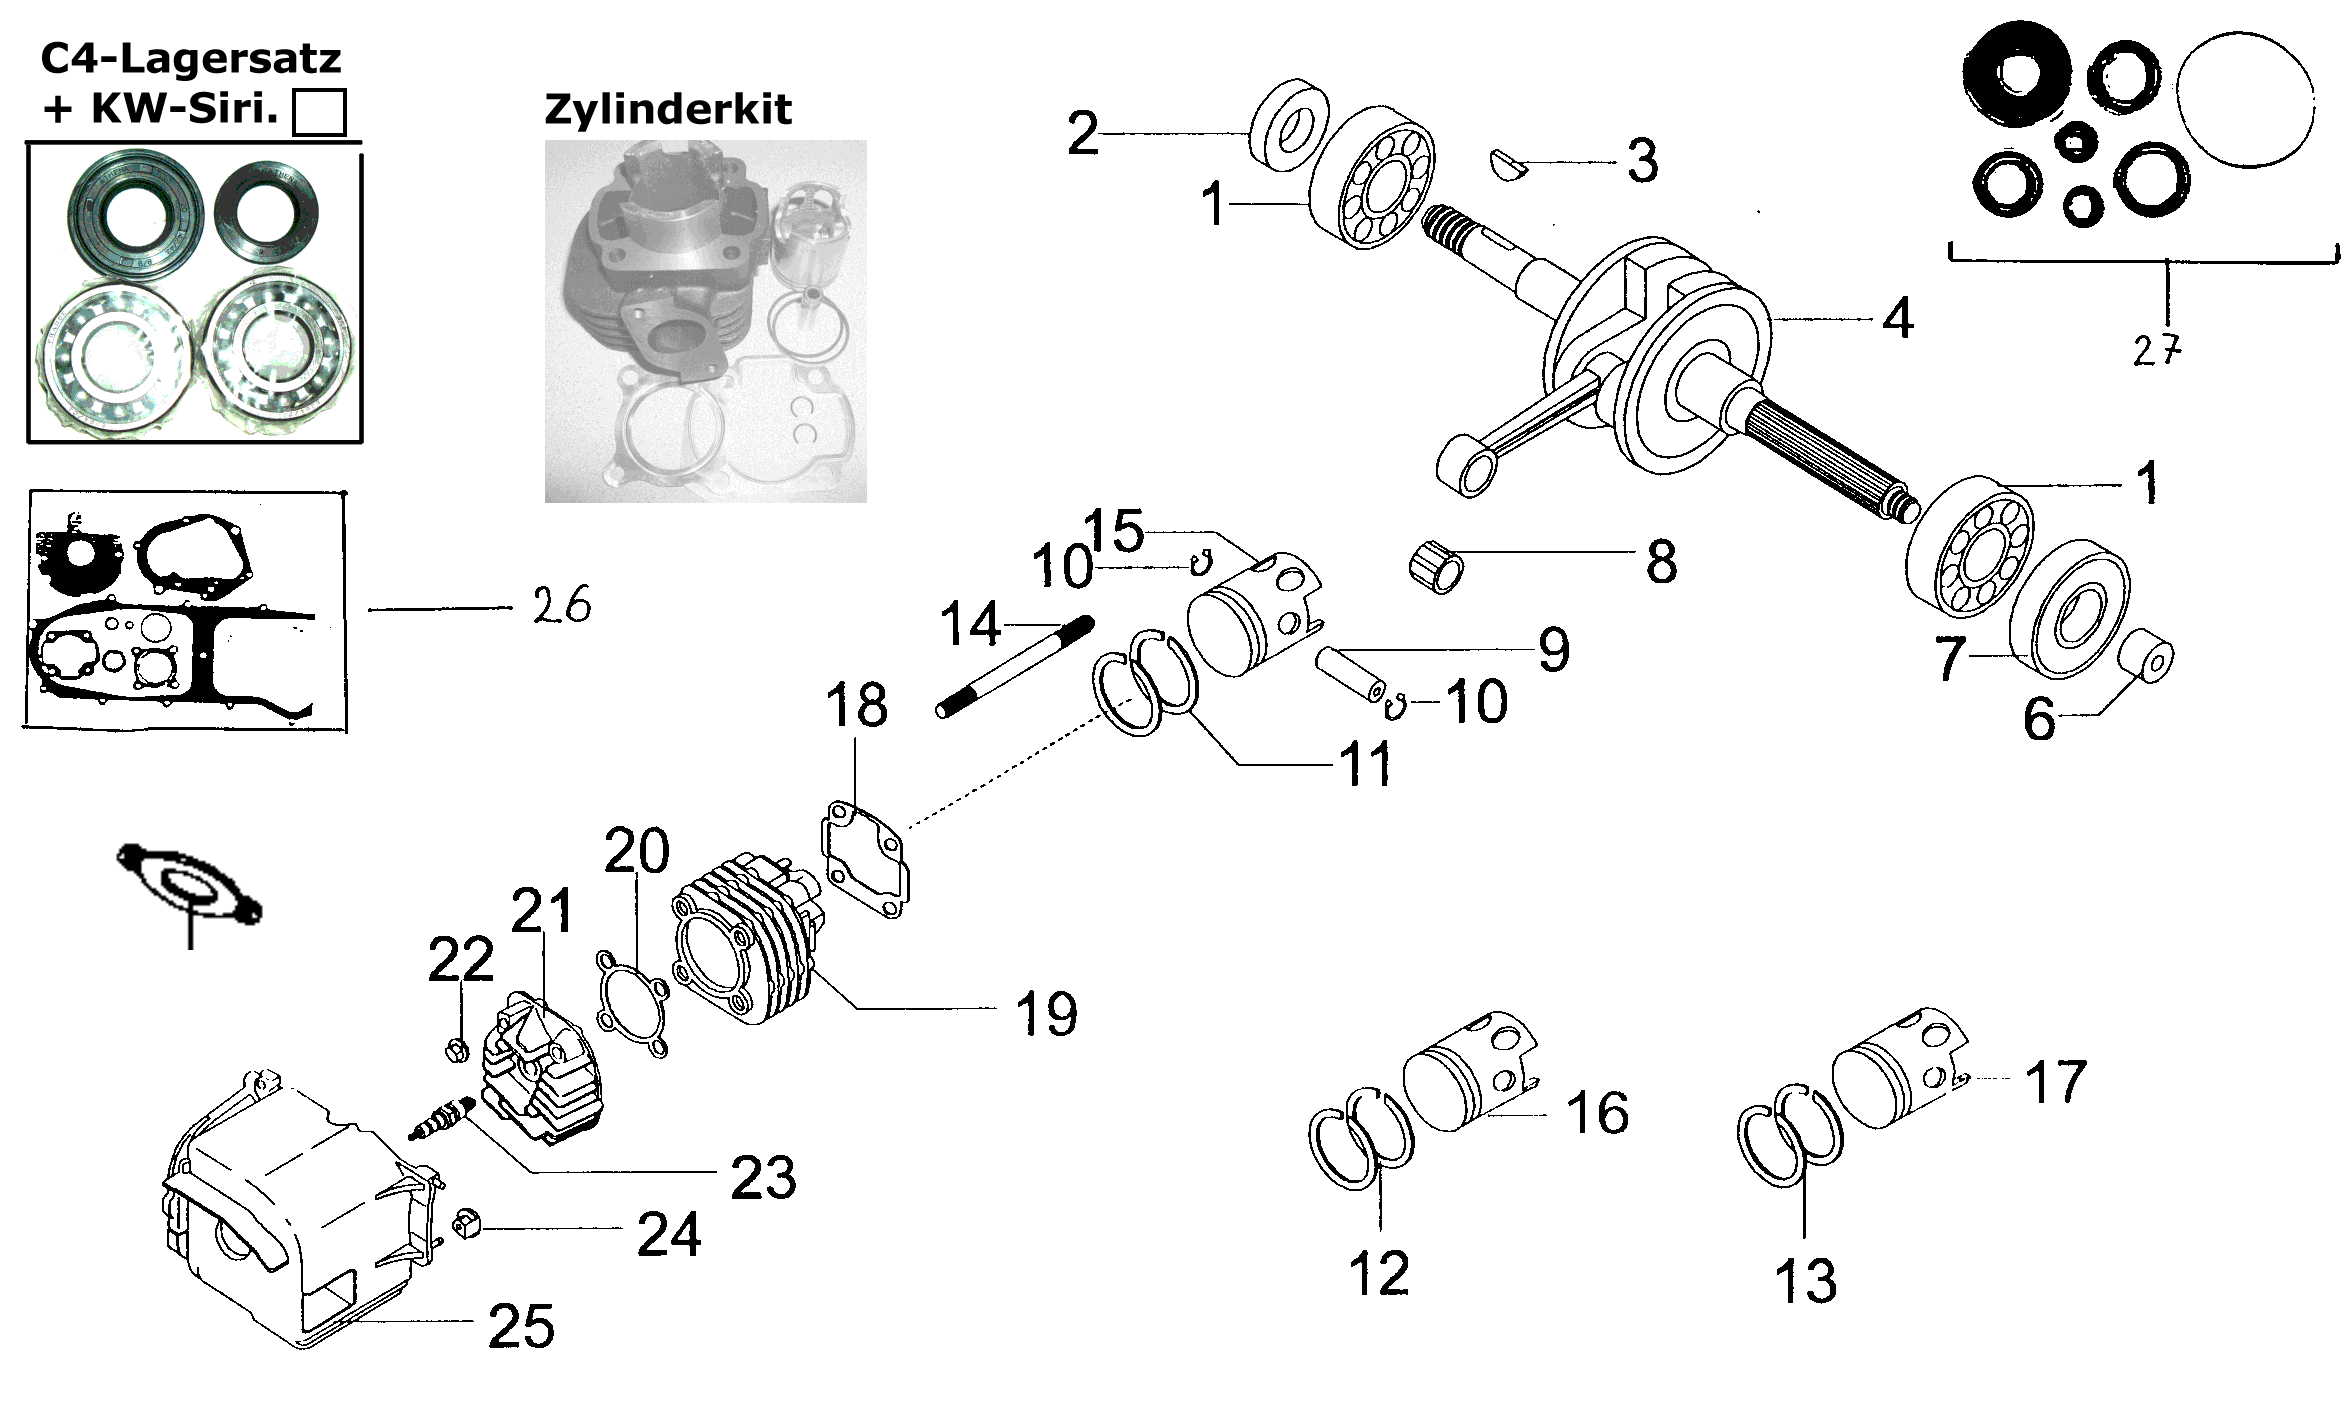 Zylinder / Kurbelwelle